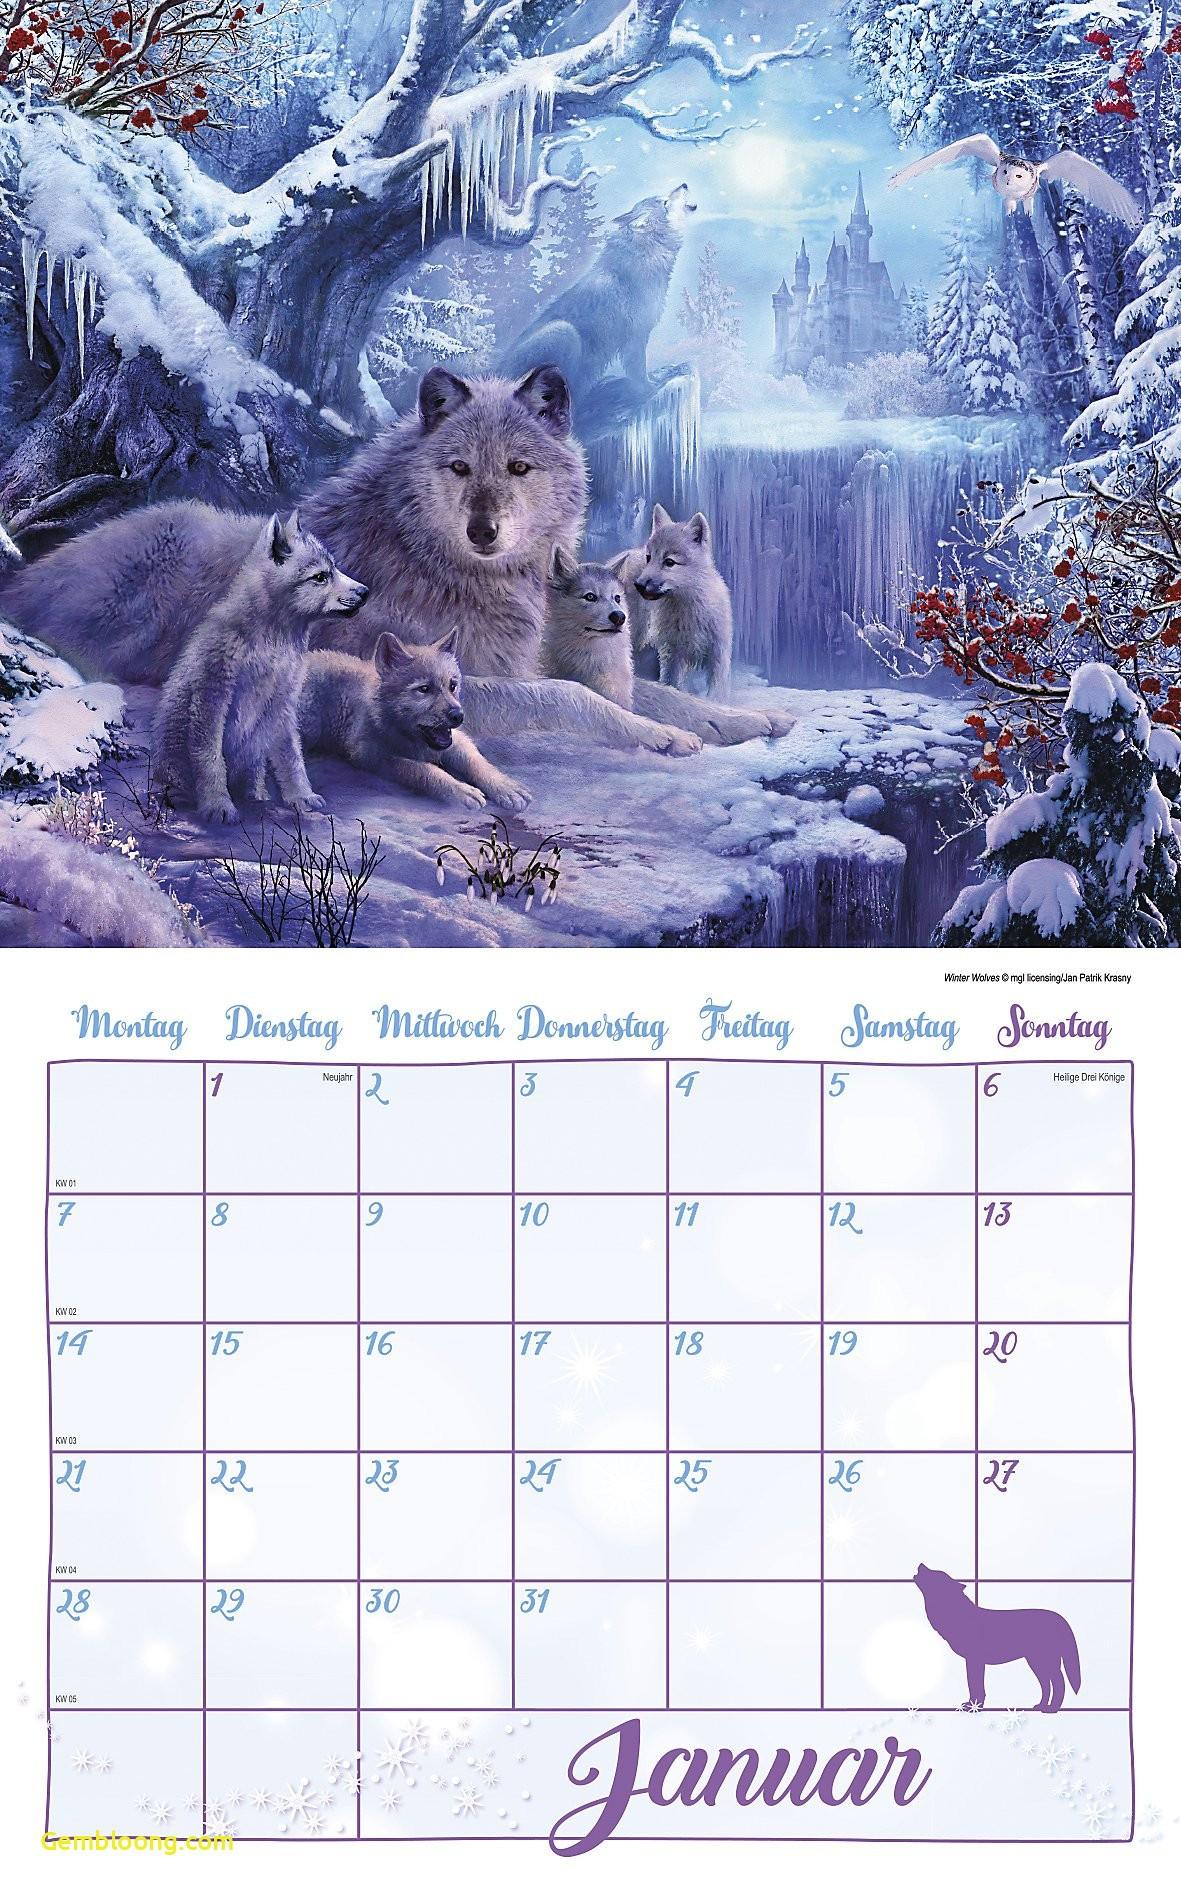 fantasy calender 2019 new fantasy kalender set 2019 8tlg kalender bei weltbild of fantasy calender 2019